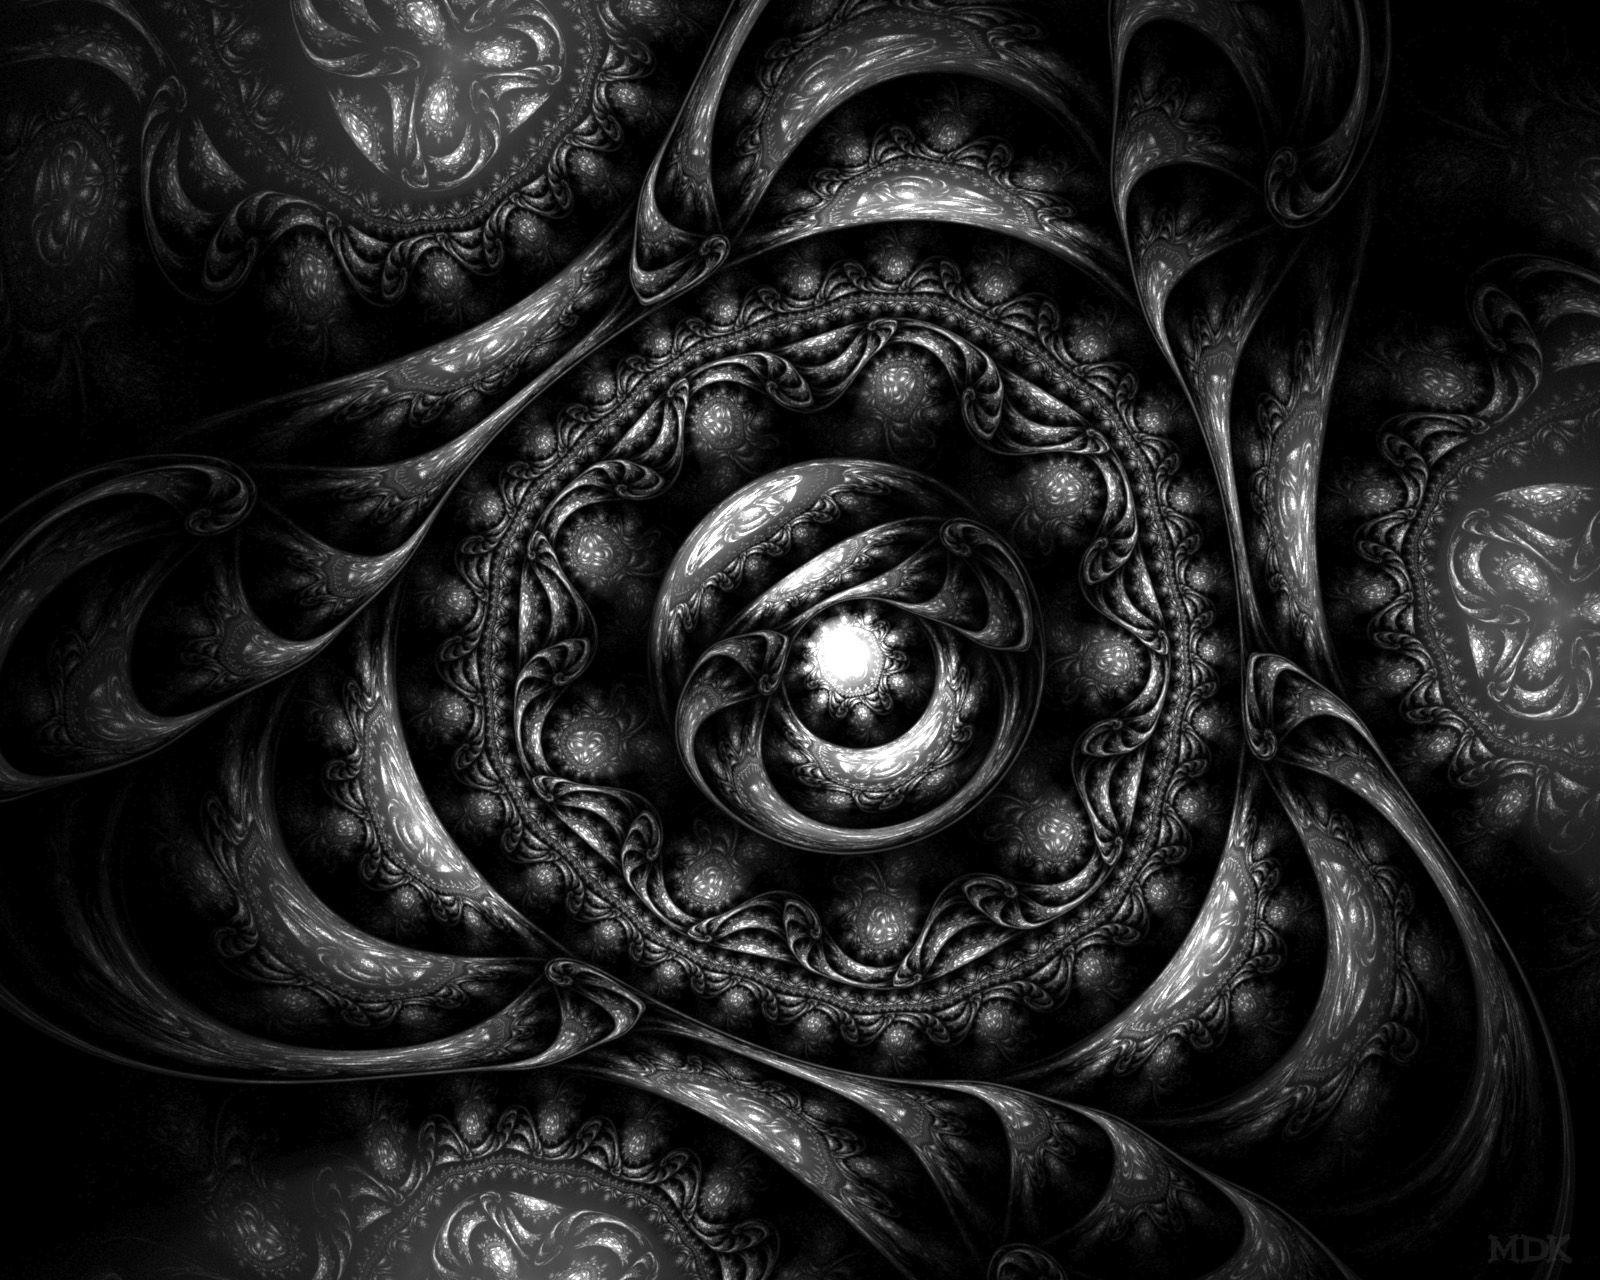 Black and white fractal  http://www.smashingmagazine.com/2009/04/26/black-and-white-fractals-that-capture-creativity/